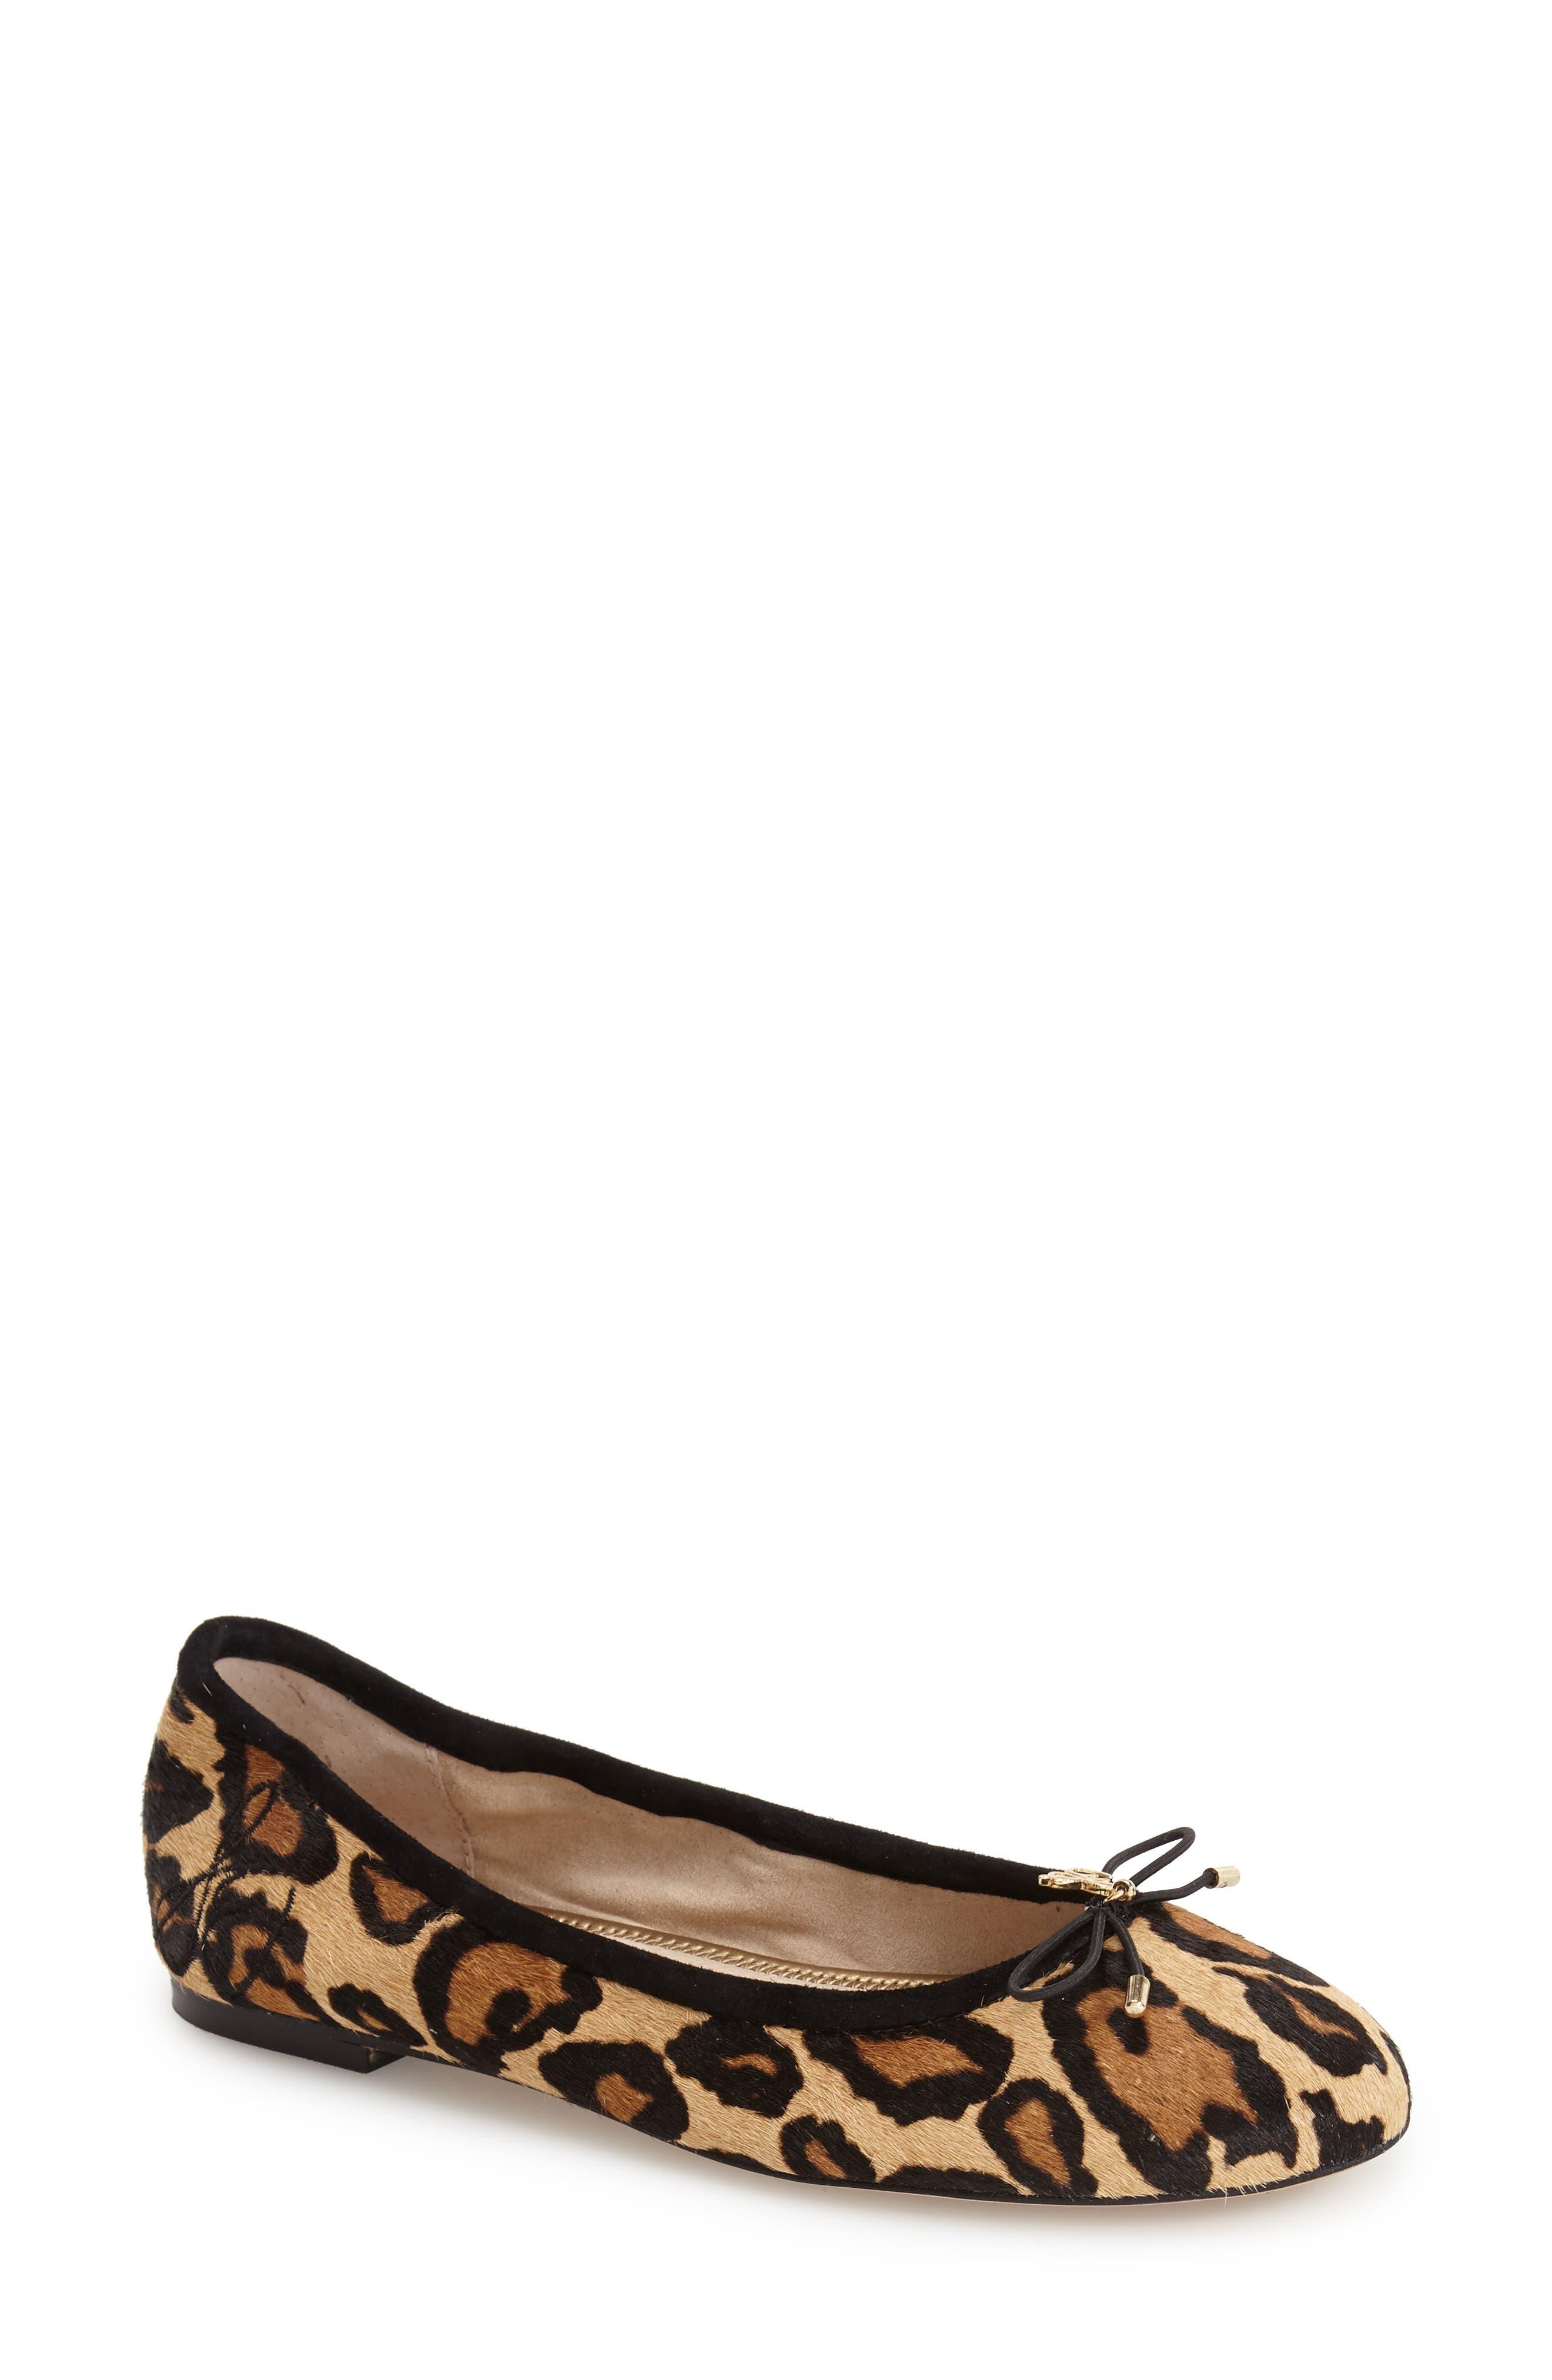 'Felicia' Flat,                             Main thumbnail 1, color,                             New Nude Leopard Calf Hair